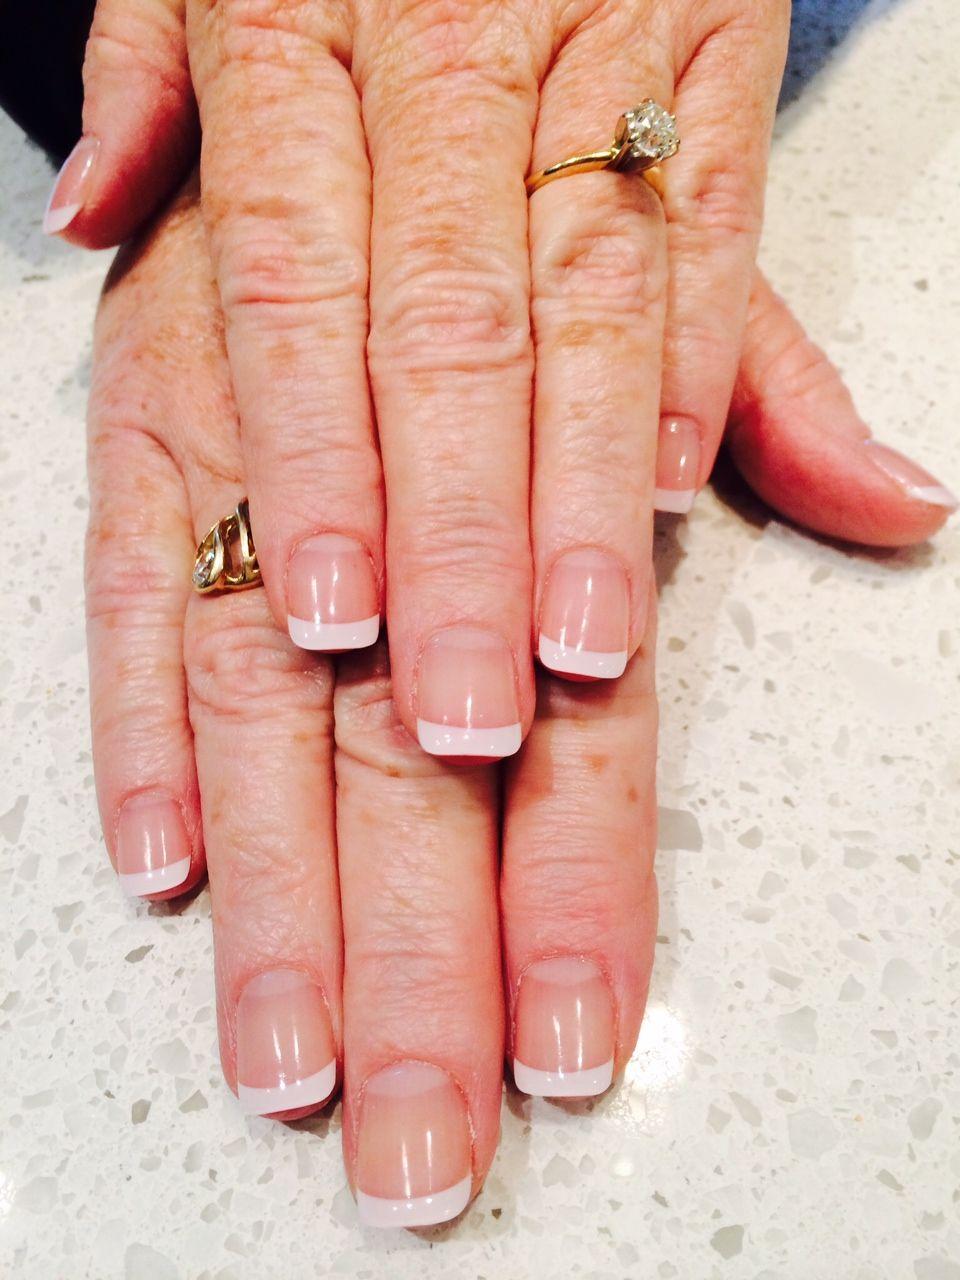 Classic White French Tip Acrylic Nails www.vitalitystudiosa.com ...